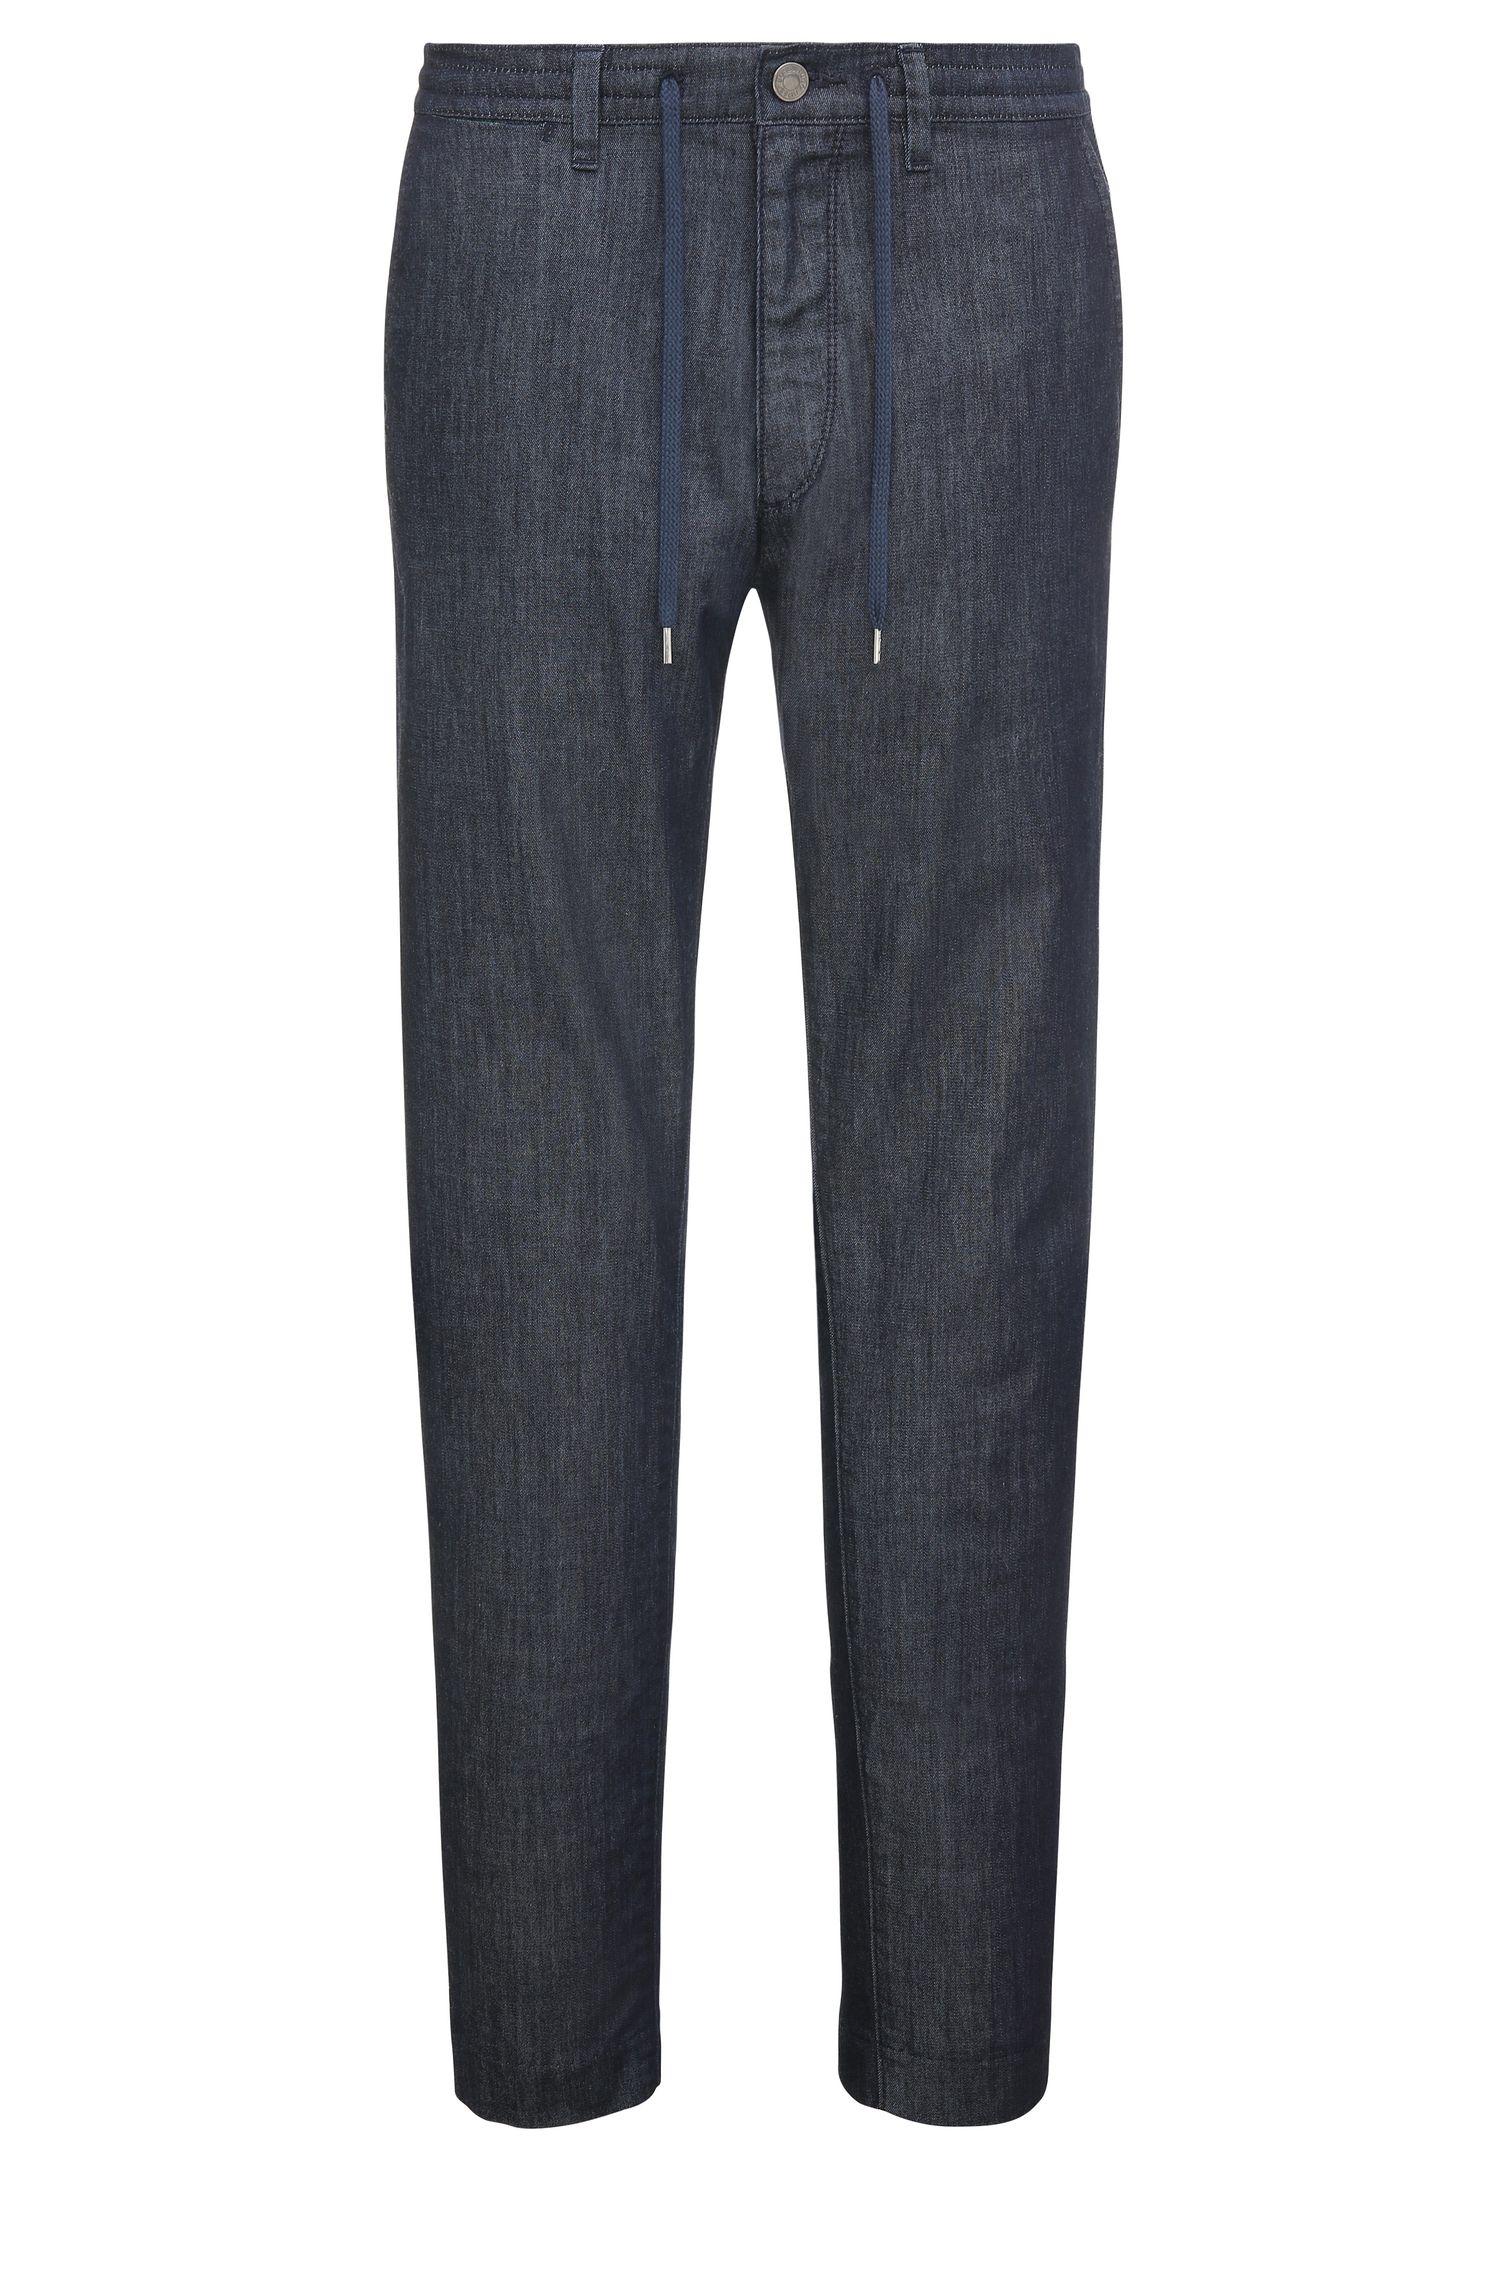 'Darrel4' | Tapered Fit, 7.6 oz Stretch Cotton Blend Jeans